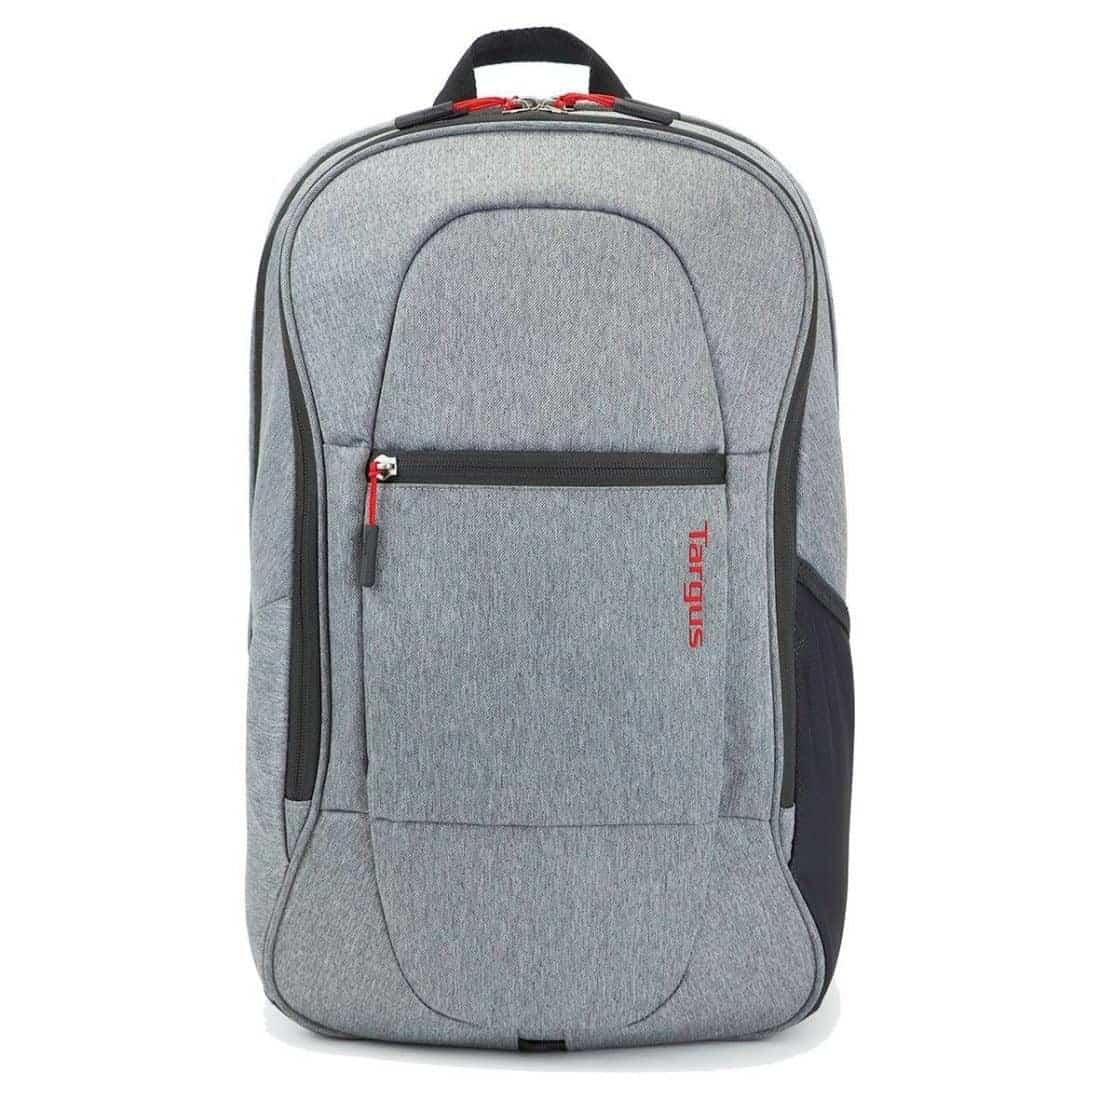 0025981_urban-commuter-156-laptop-backpack-grey